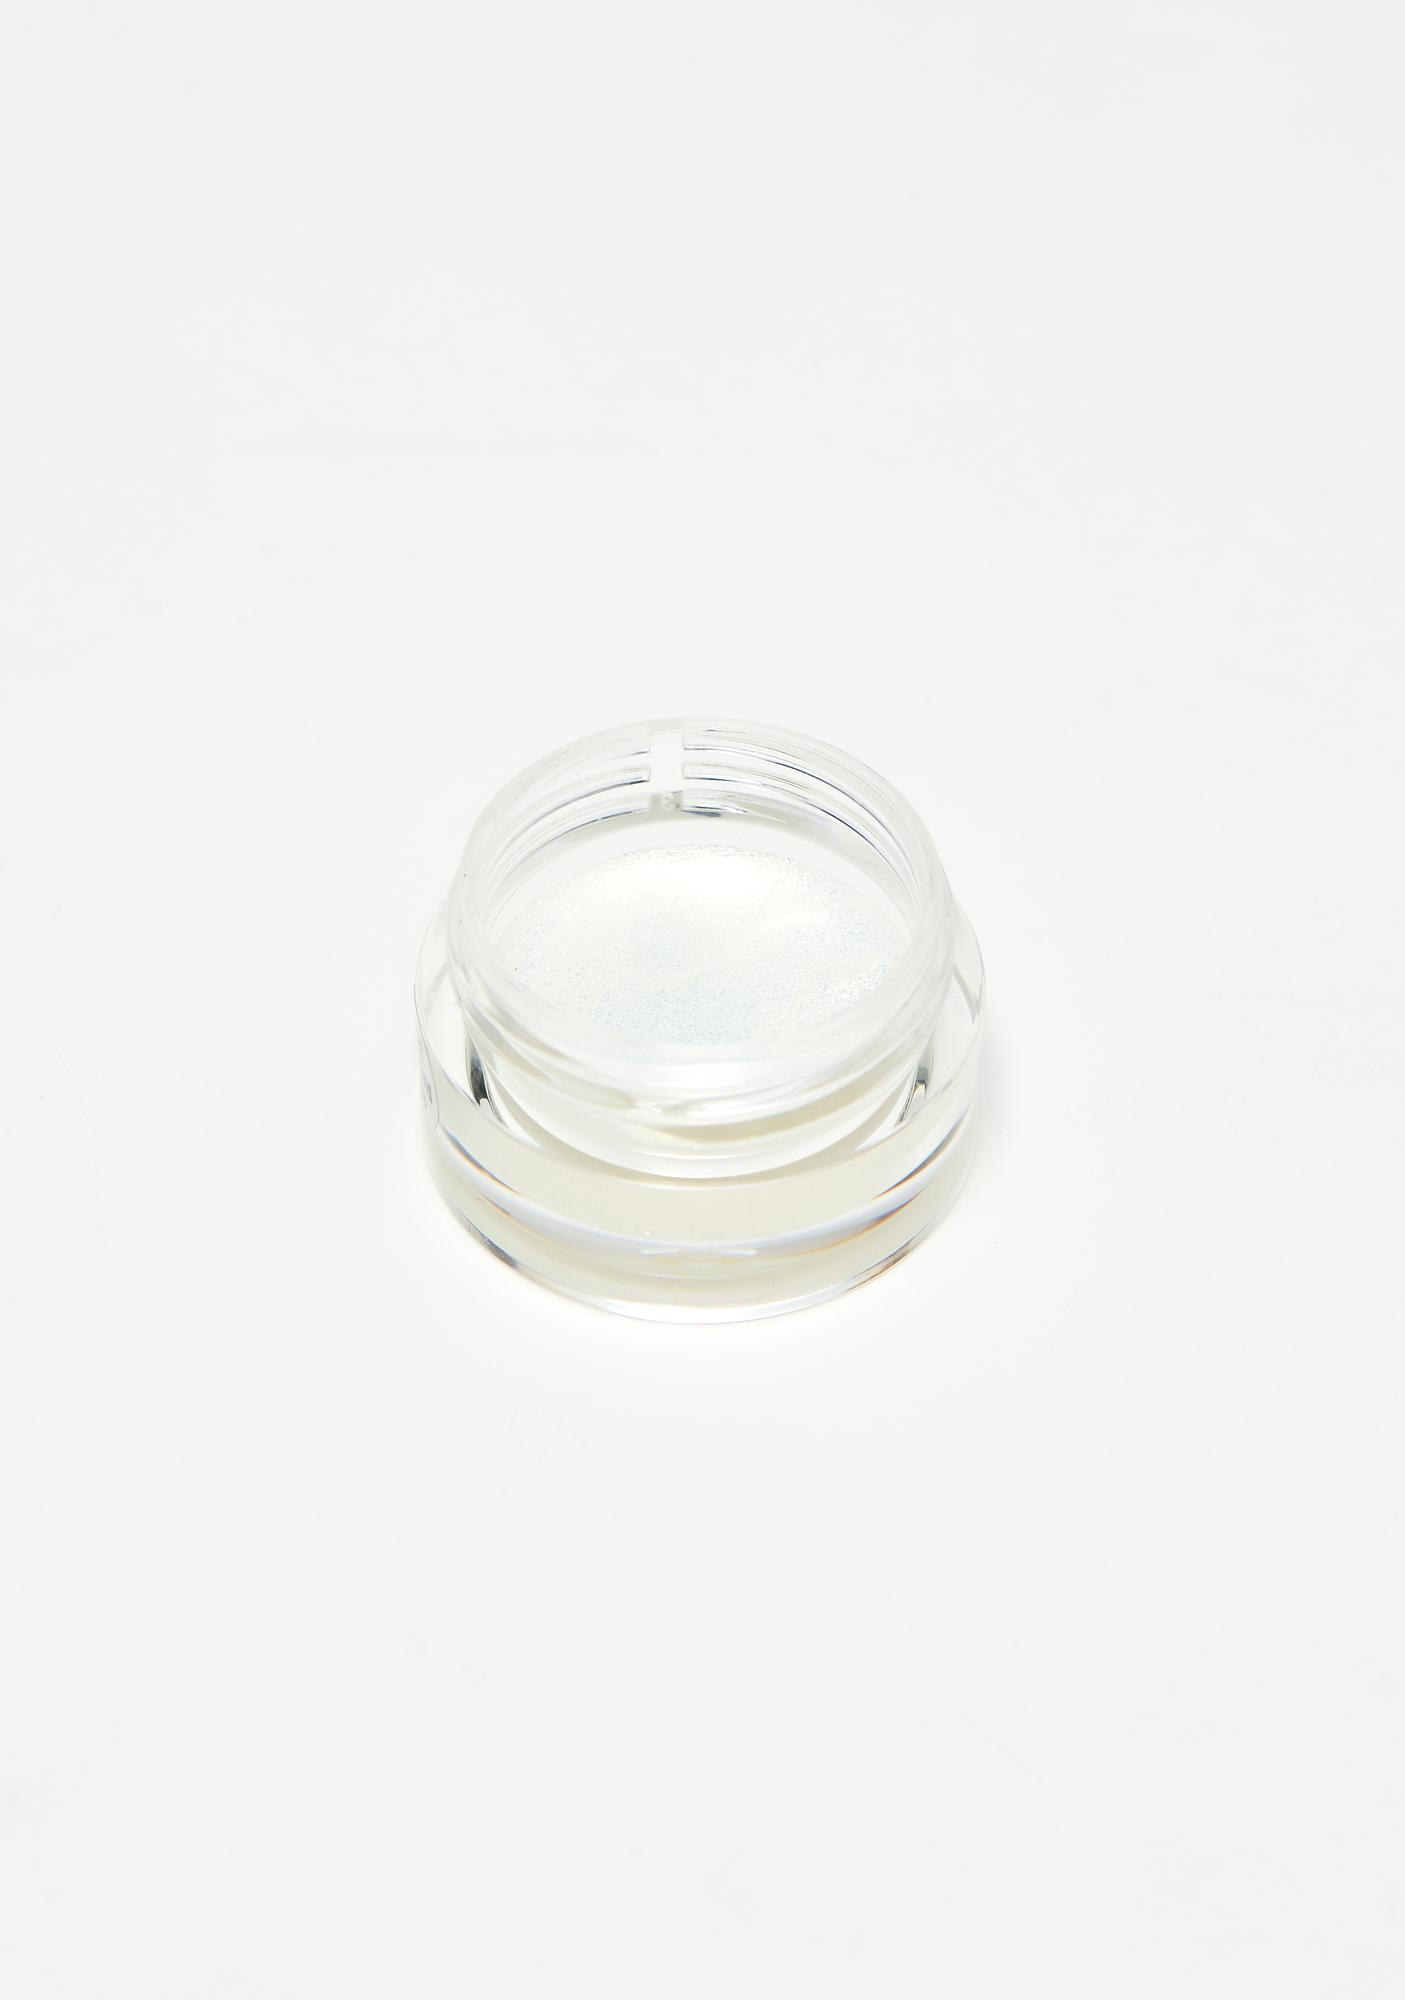 Rude Cosmetics Bondage Sparkle Me Til' It Hurts Face N' Body Shimmer